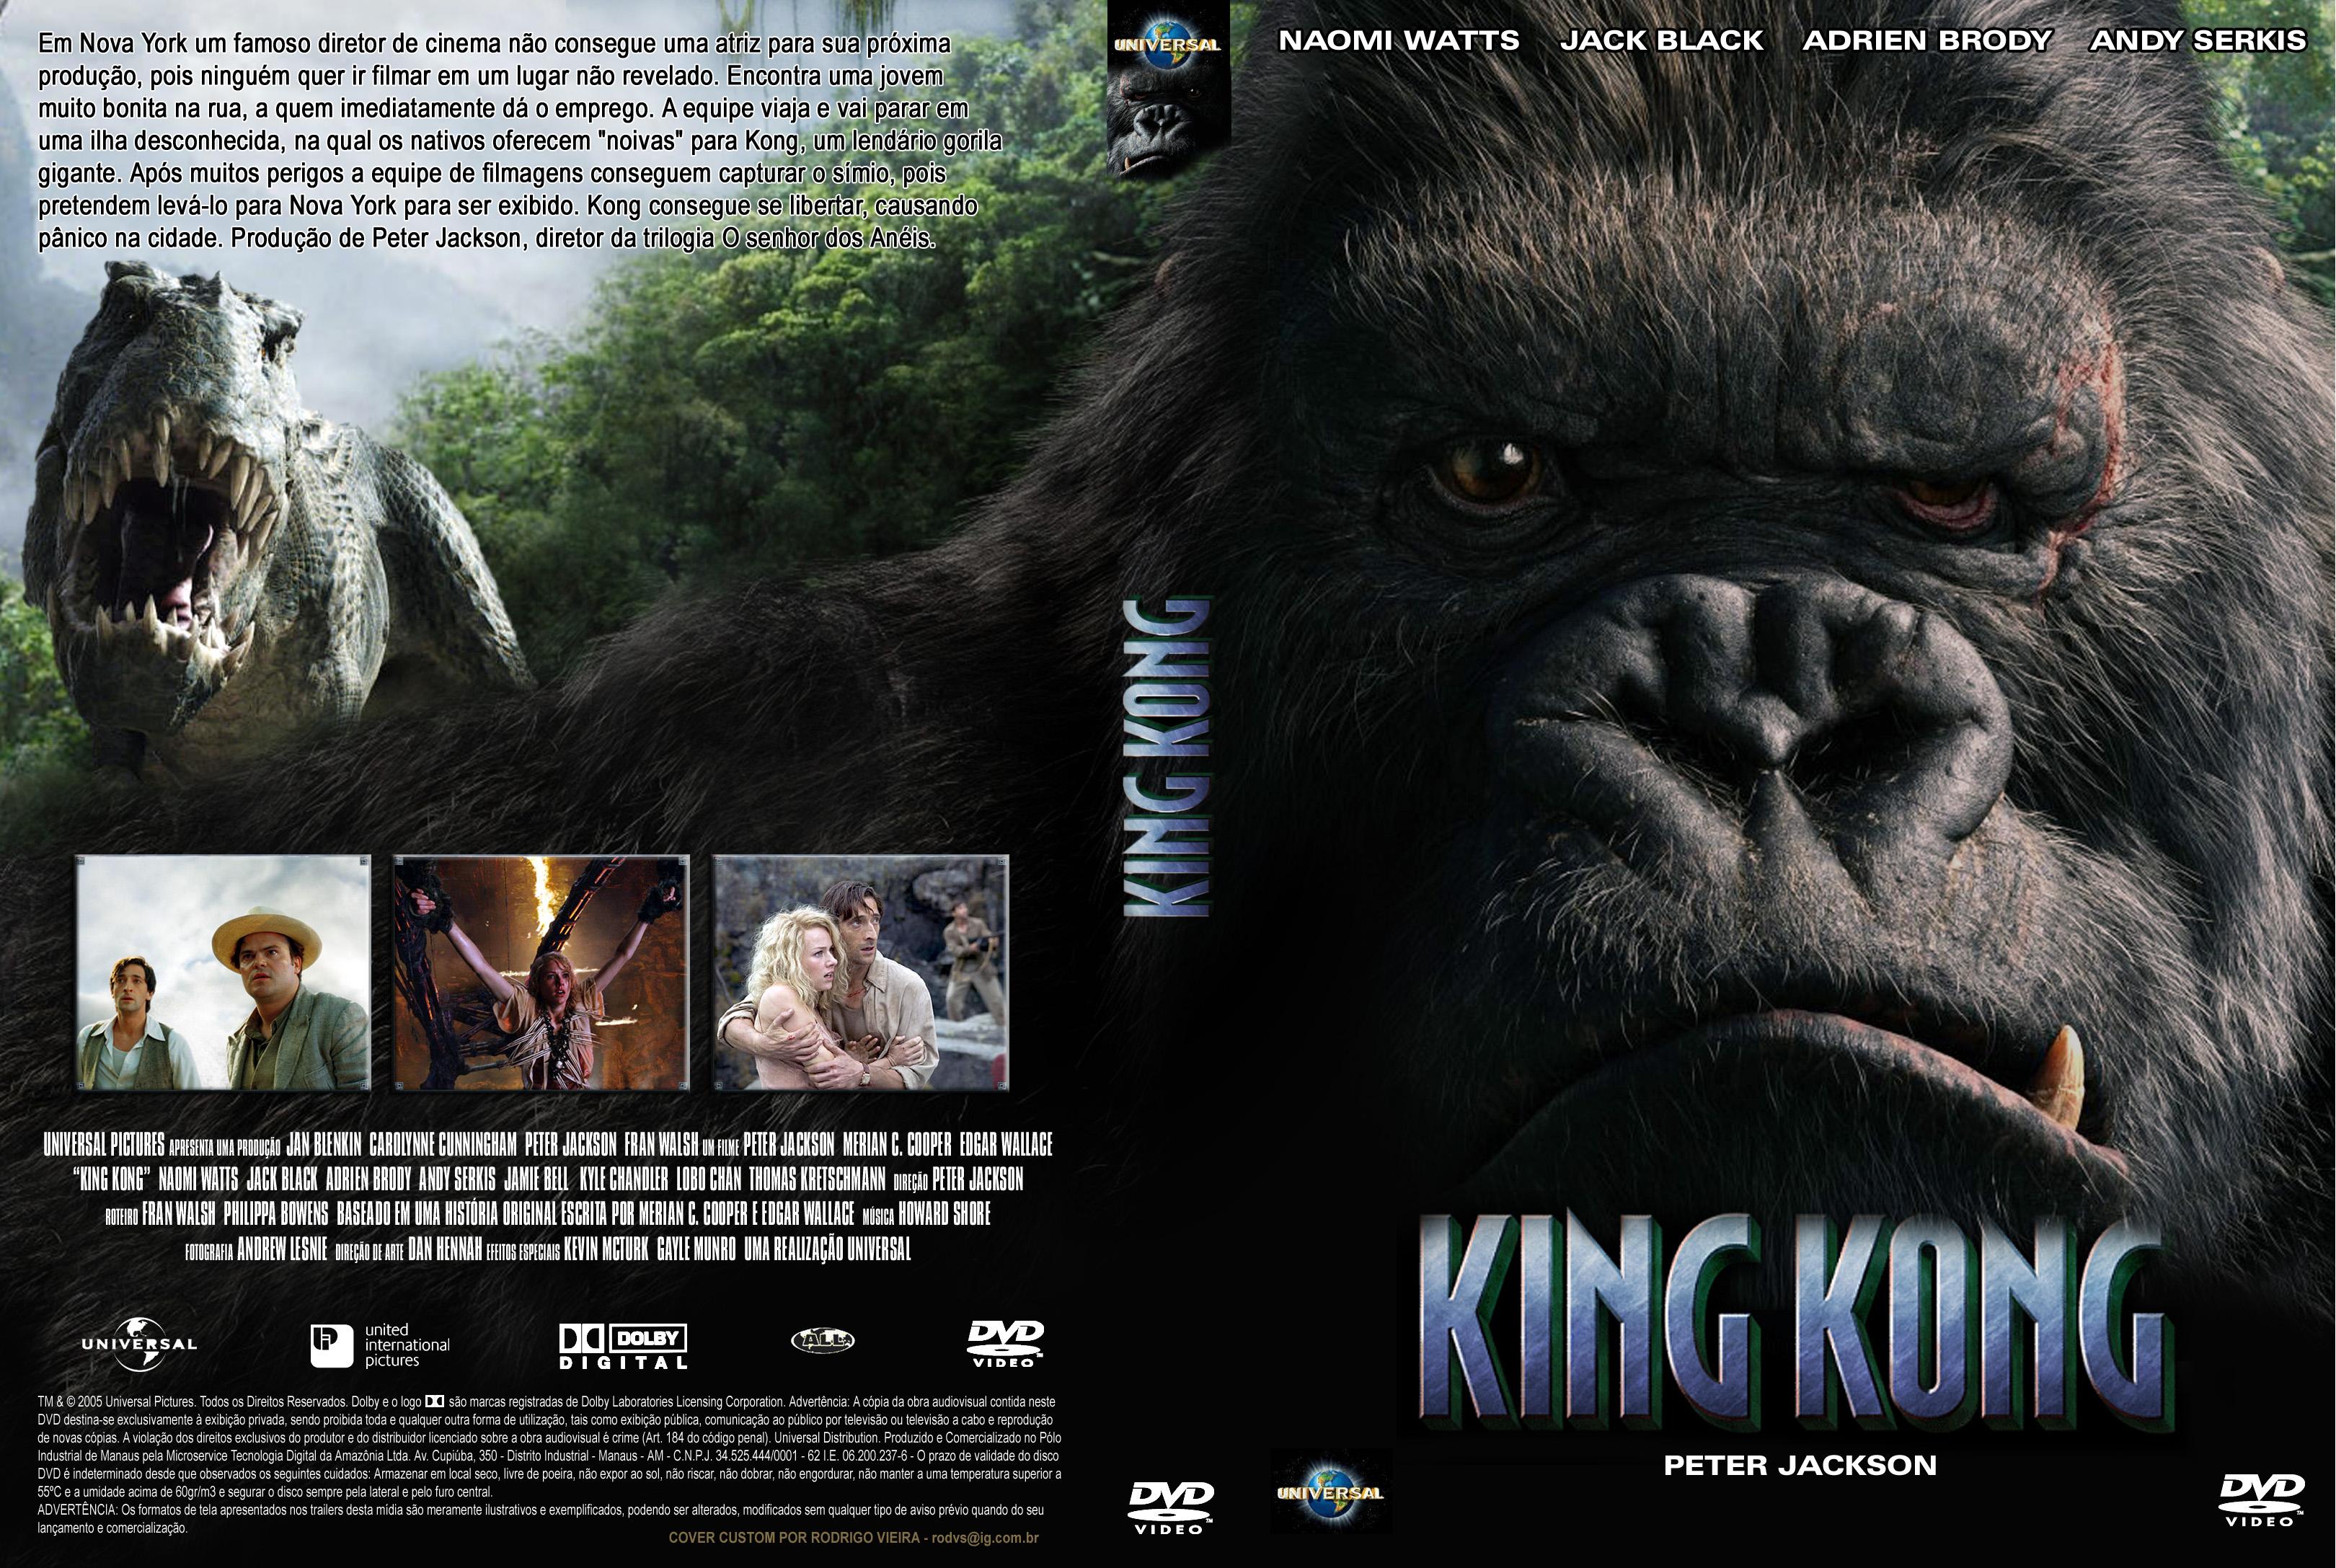 King Kong 2005 Quotes Quotesgram